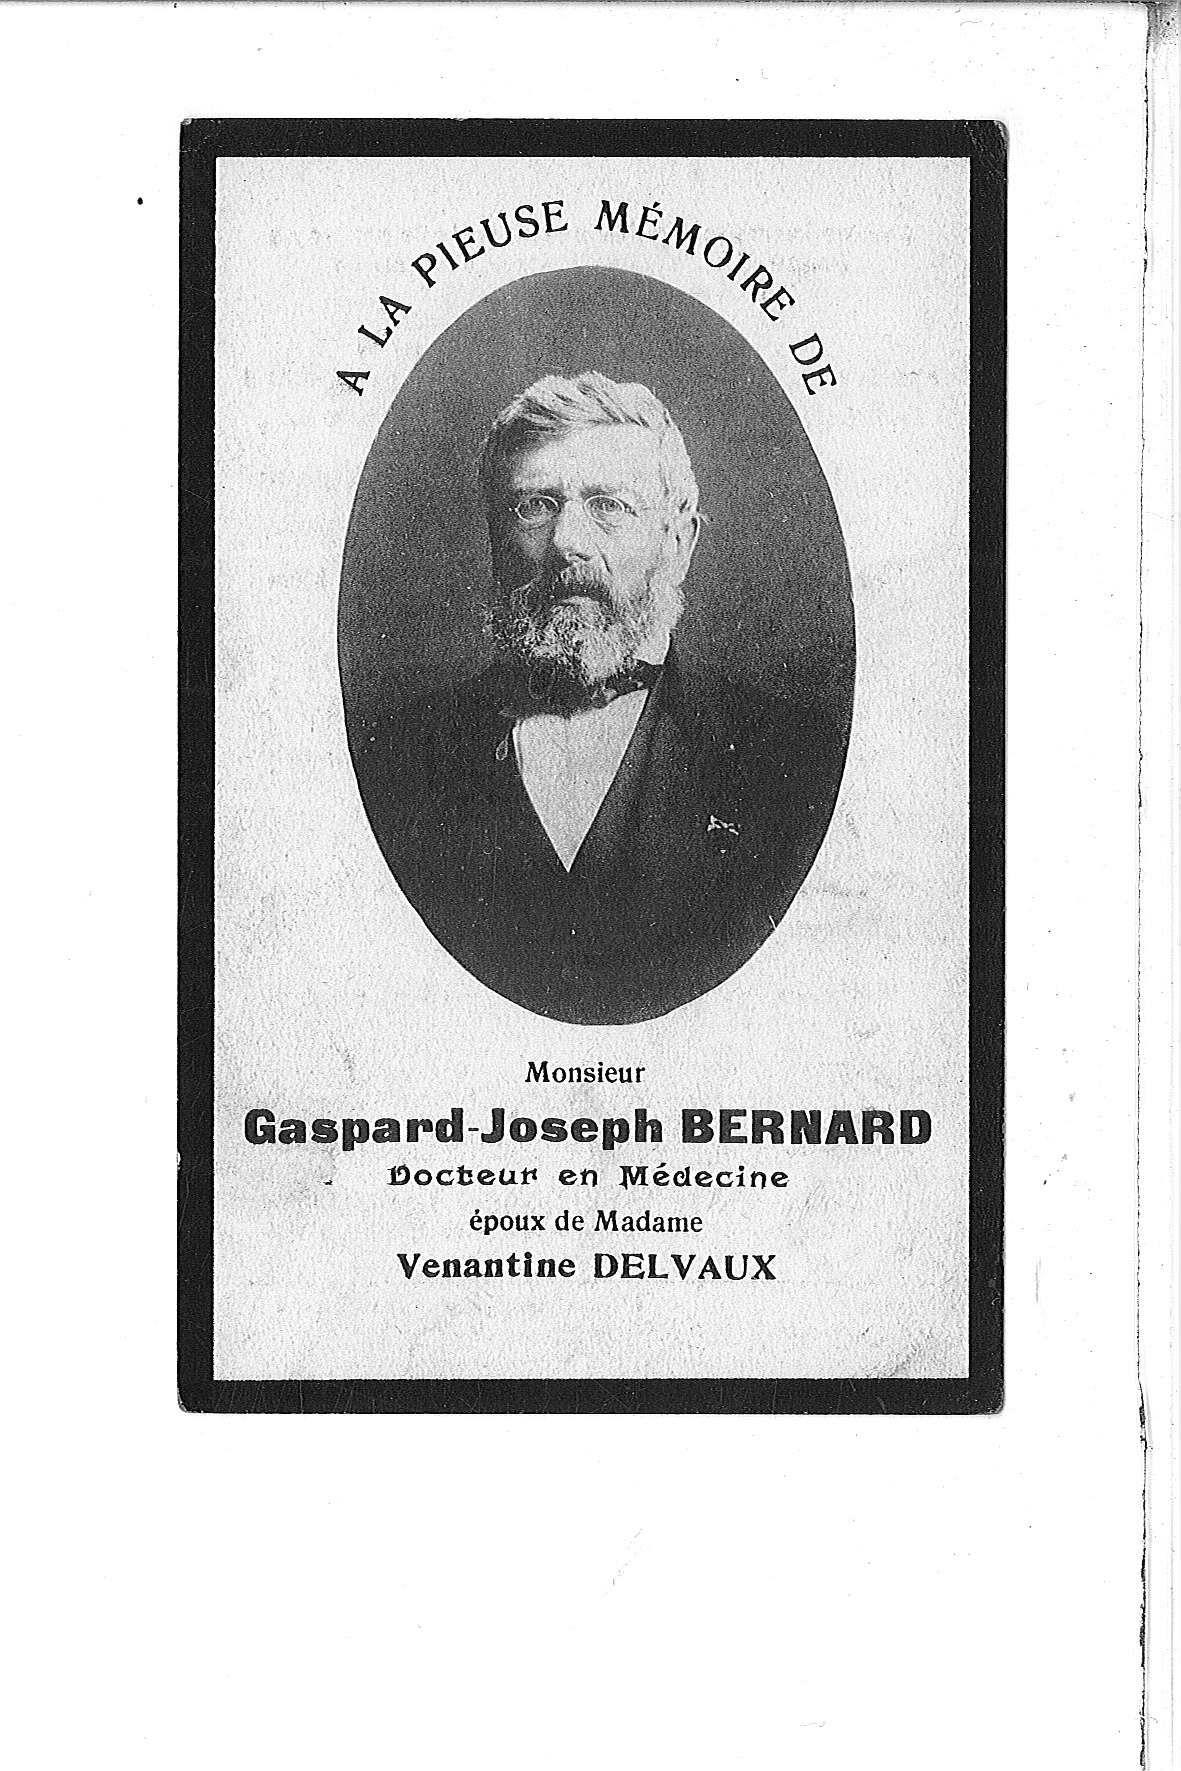 Gaspard-Joseph(1909)20110114104901_00045.jpg